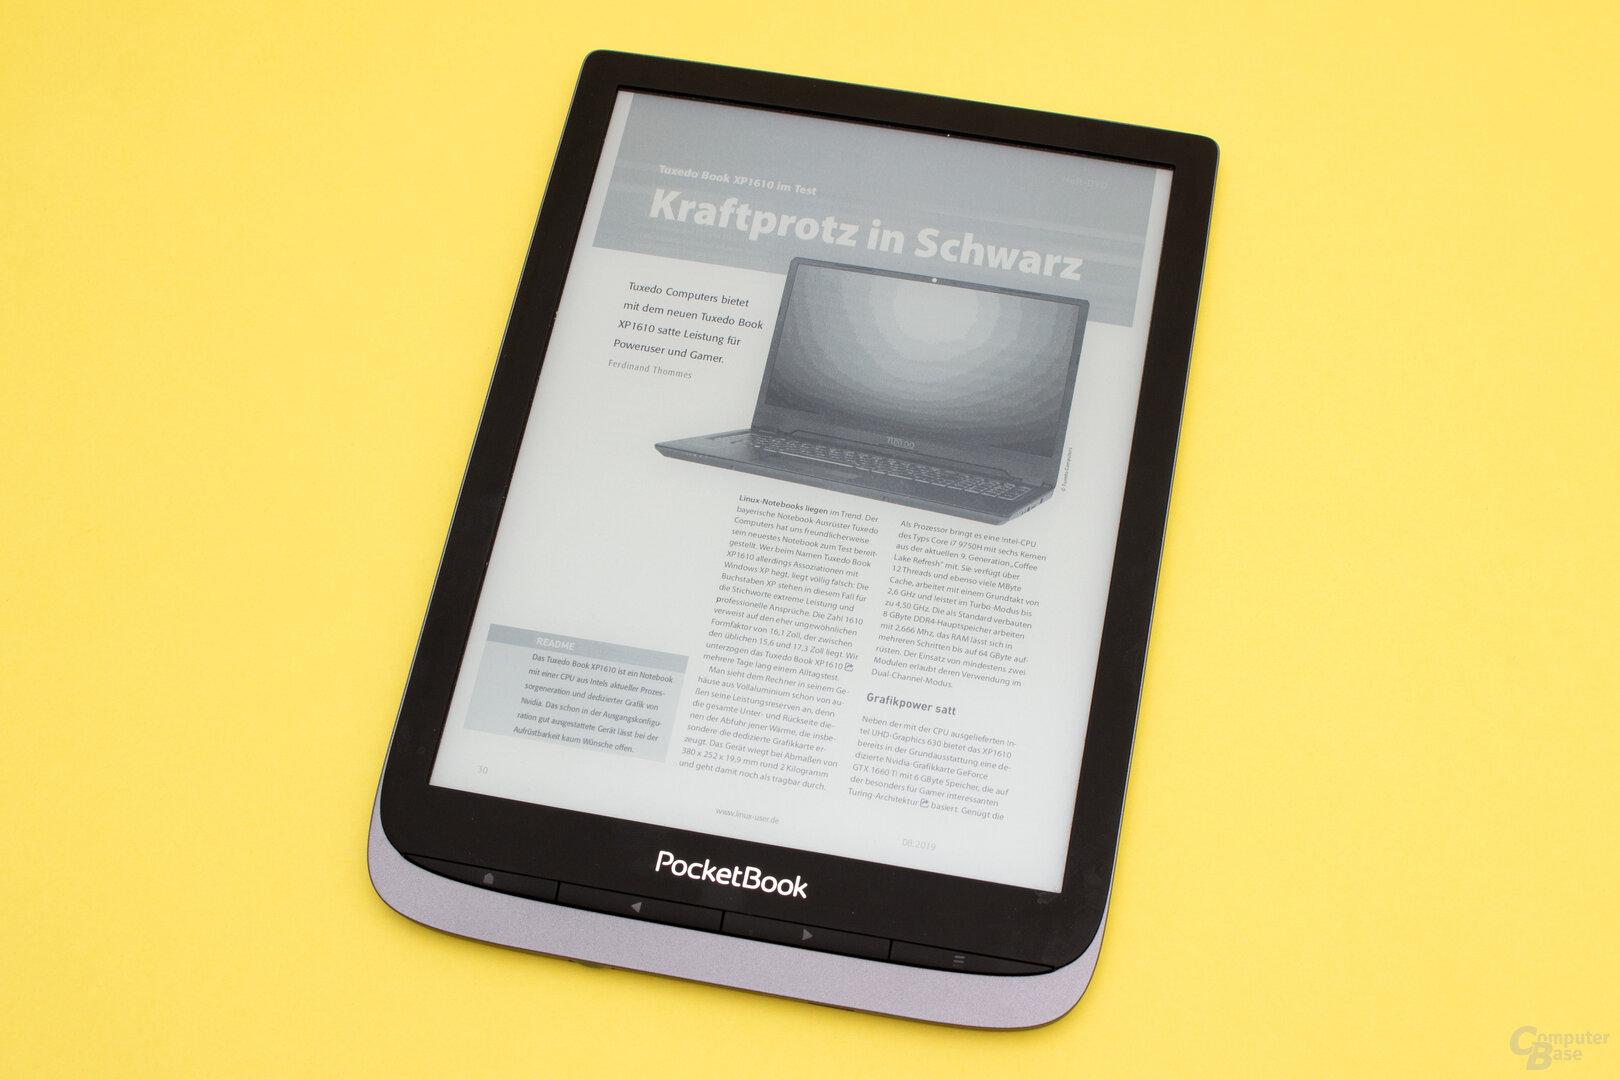 PDF-Darstellung auf dem InkPad 3 Pro